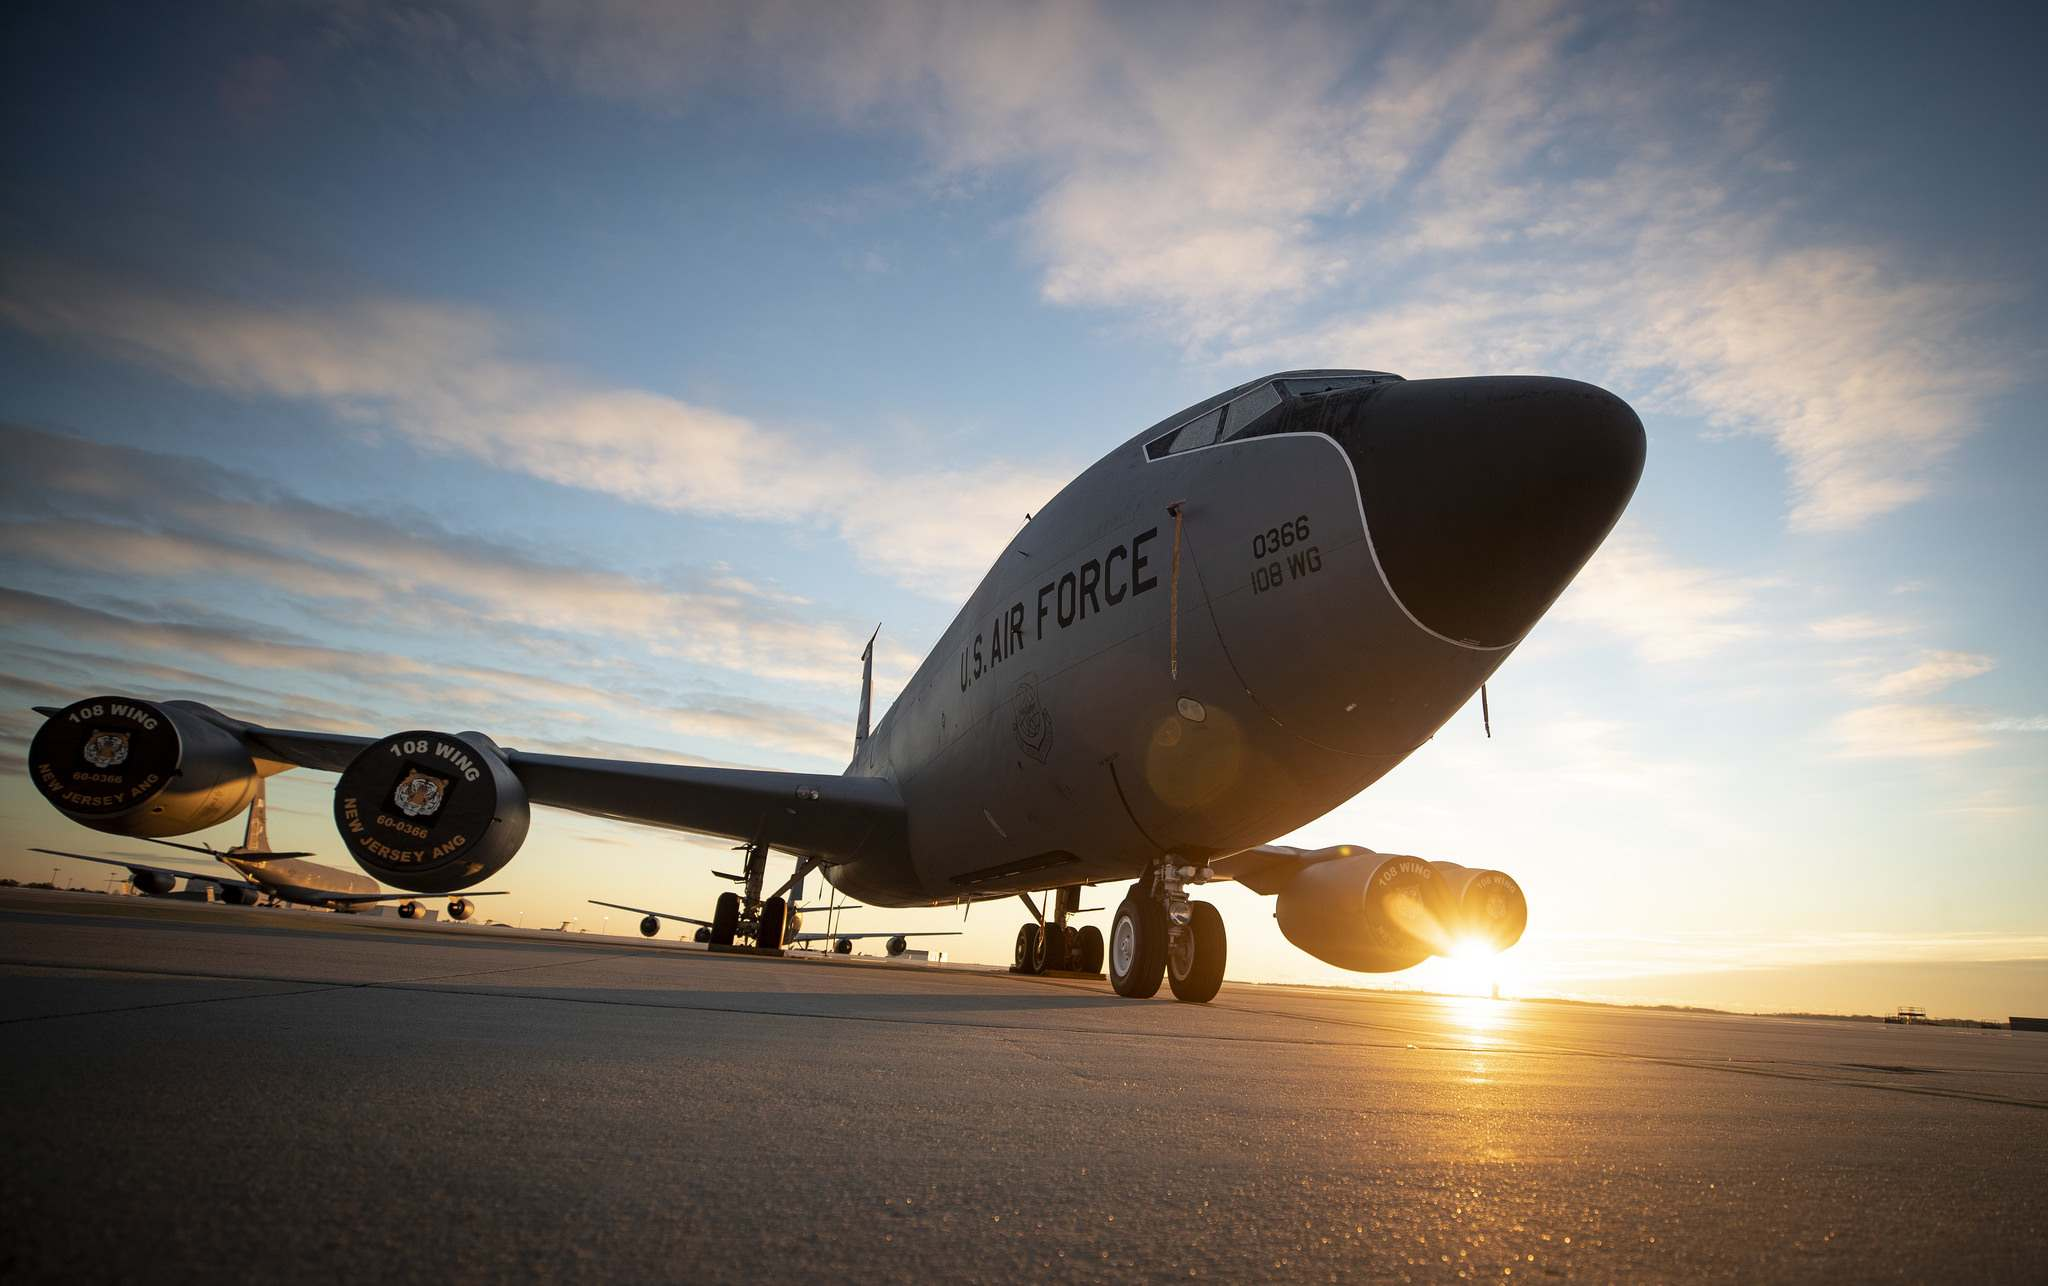 boeing kc 1352 Boeing KC 135R Stratotanker Photos